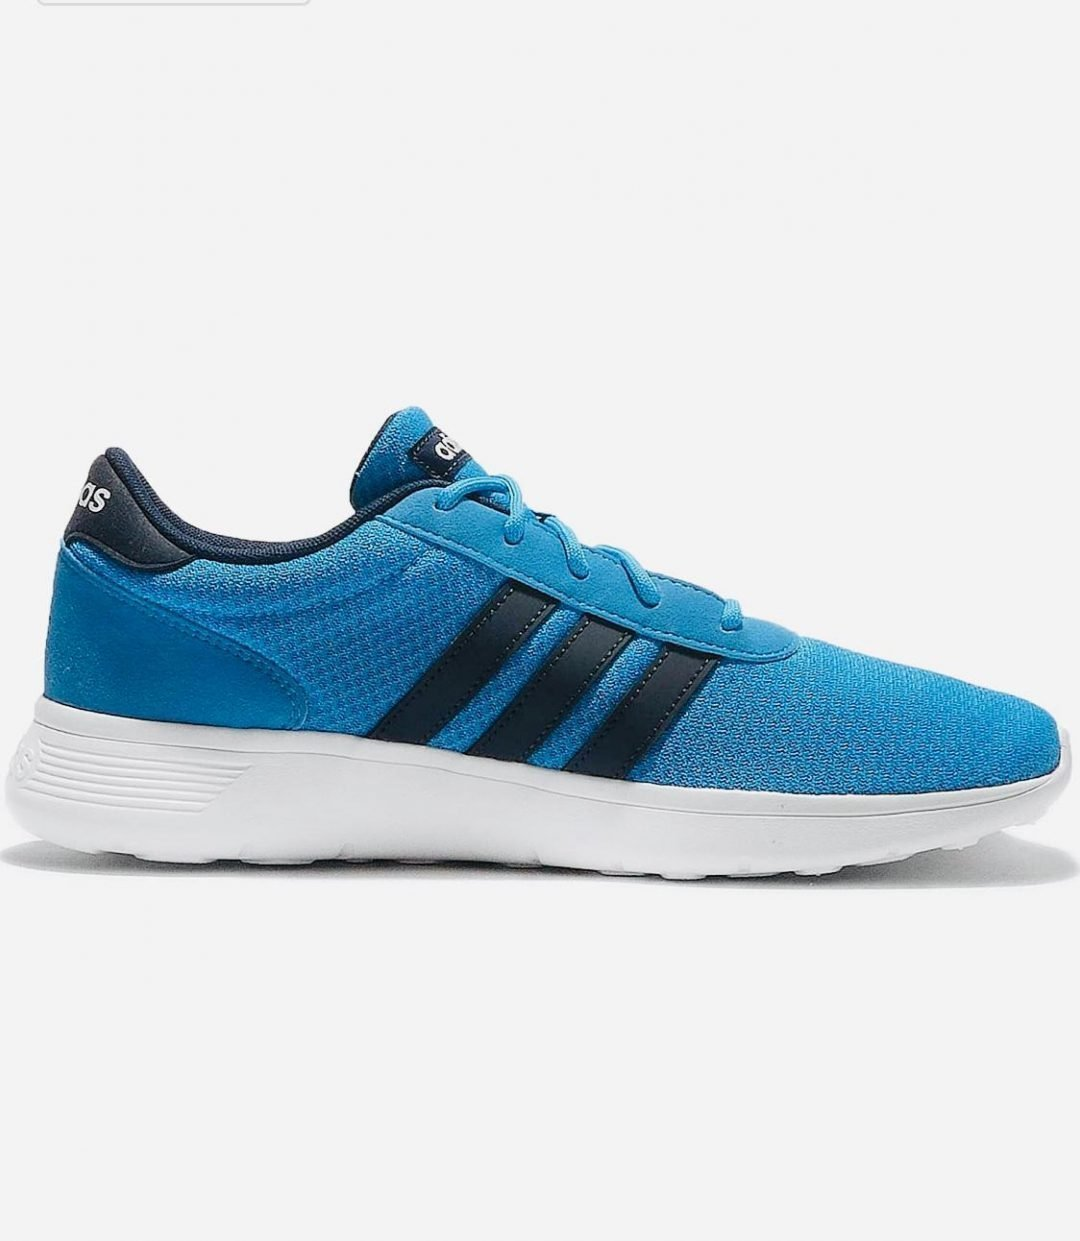 Adidas Lite Racer 2